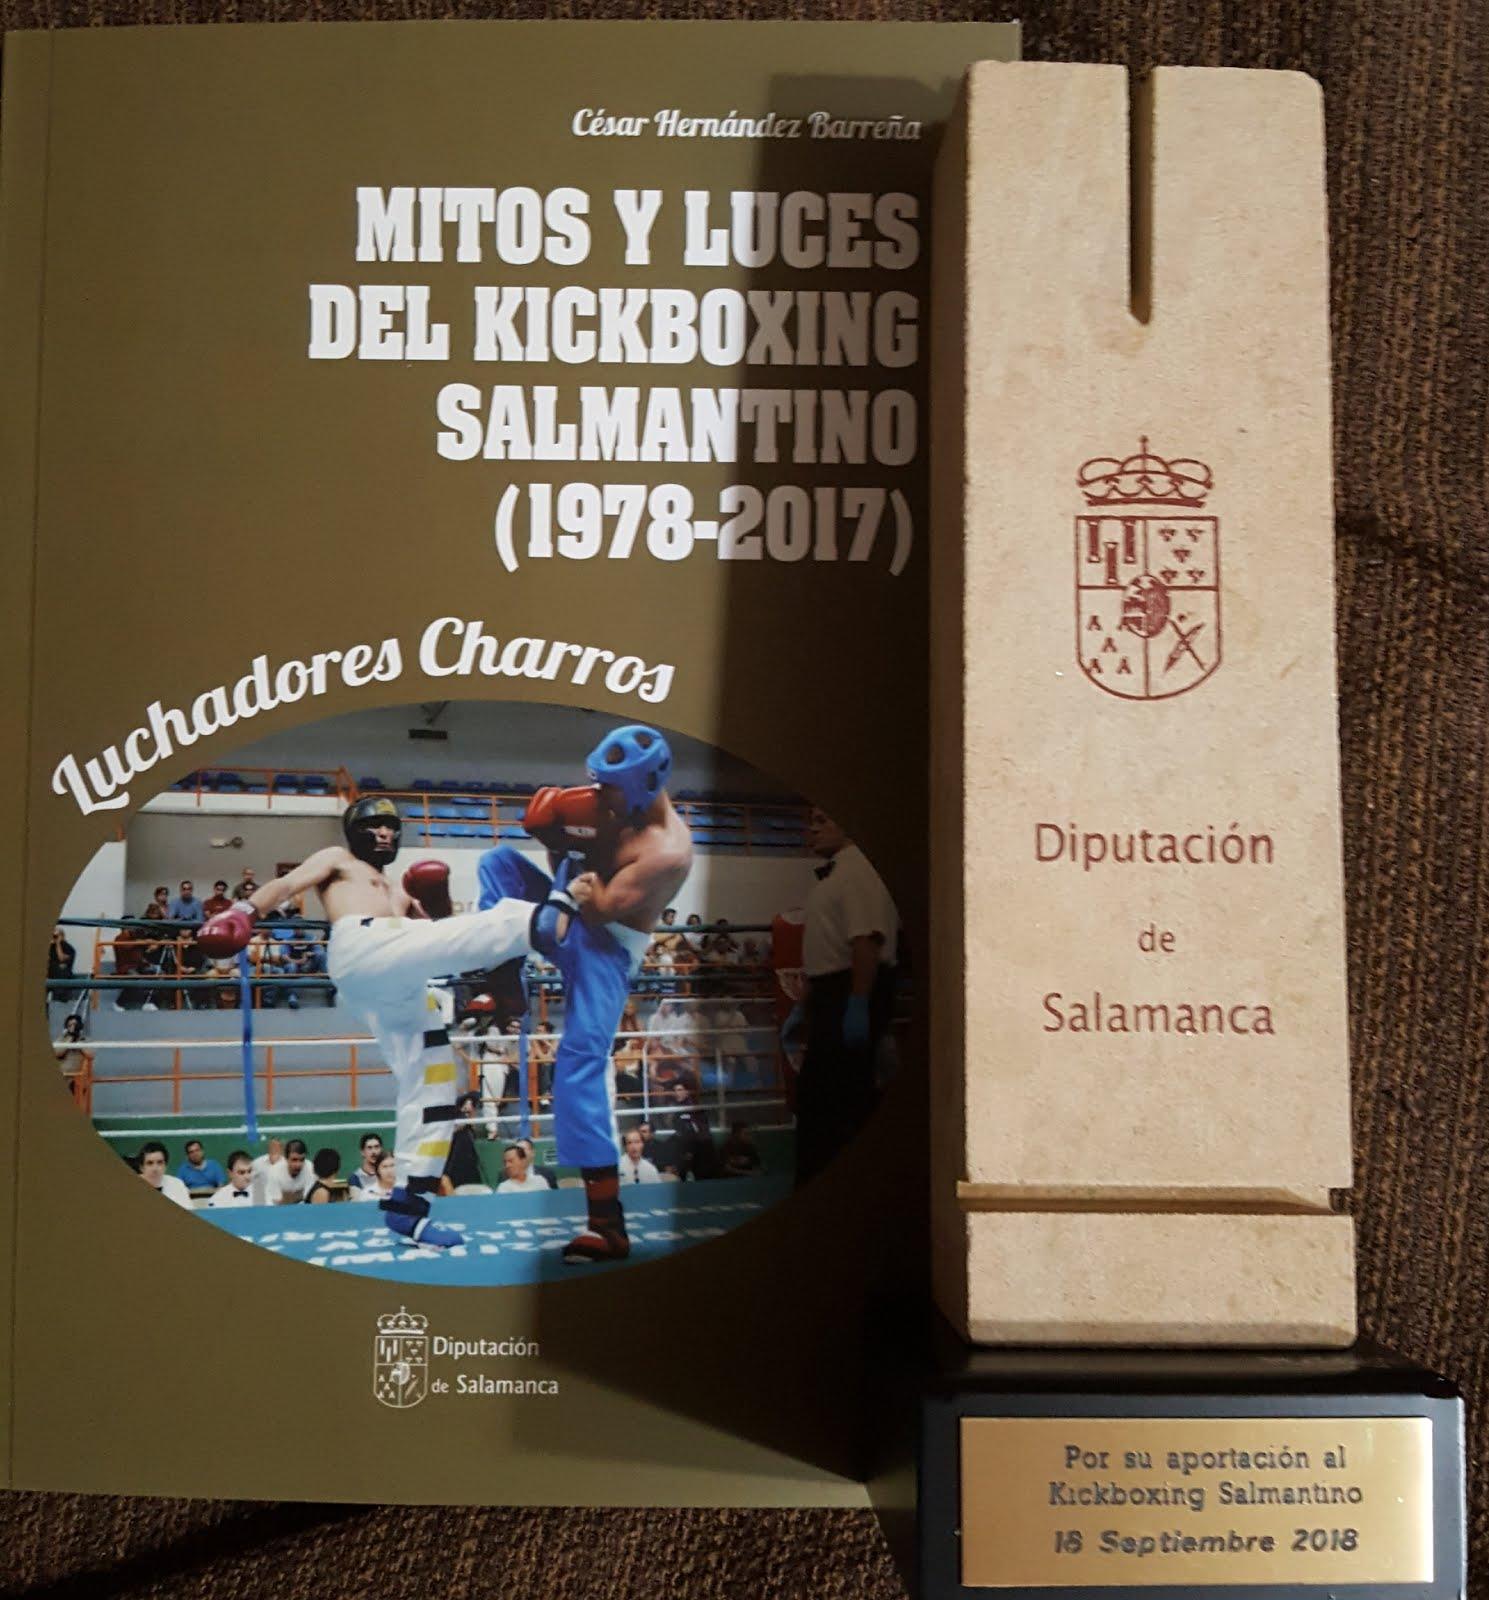 Obsequio por la aportacion al Kick Boxing Sep 2018